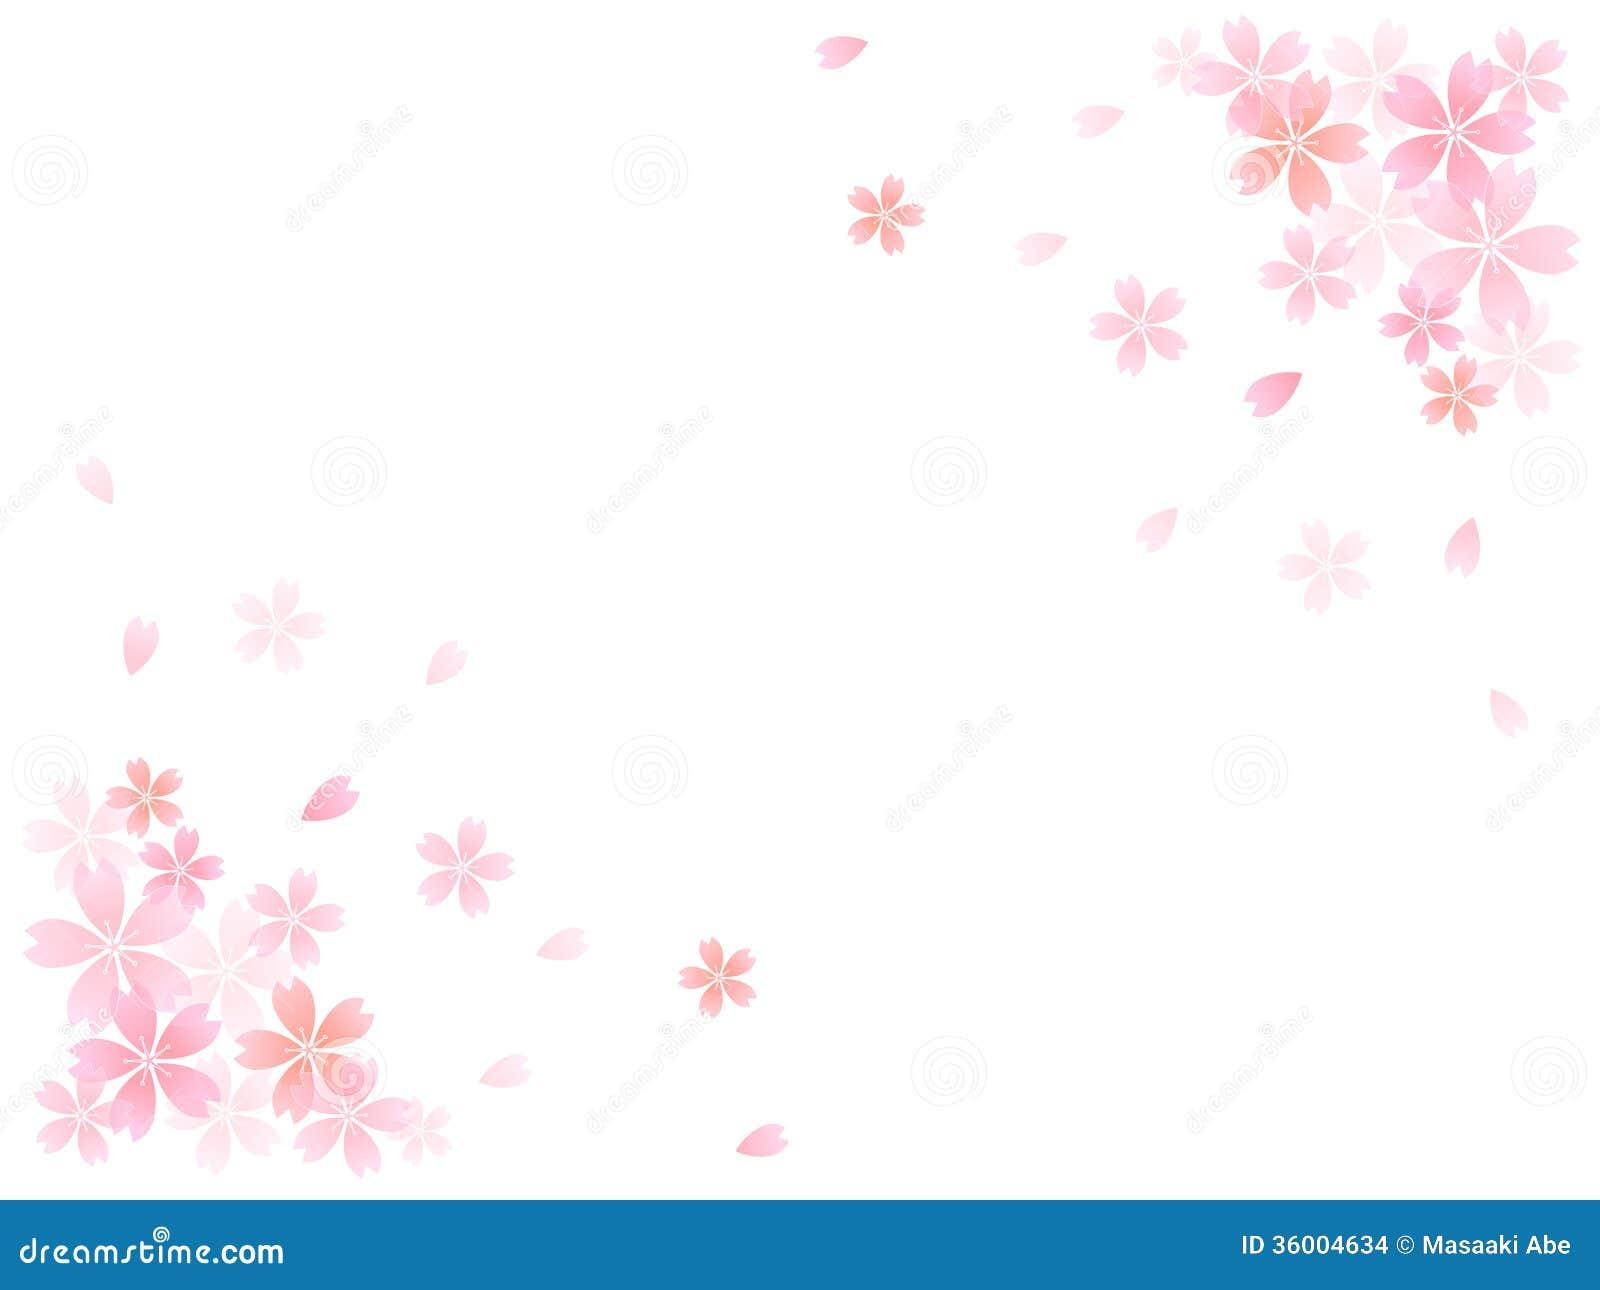 sakura cherry tree background stock images image 36004634 cherry blossoms clip art black and white cherry blossoms clip art black and white